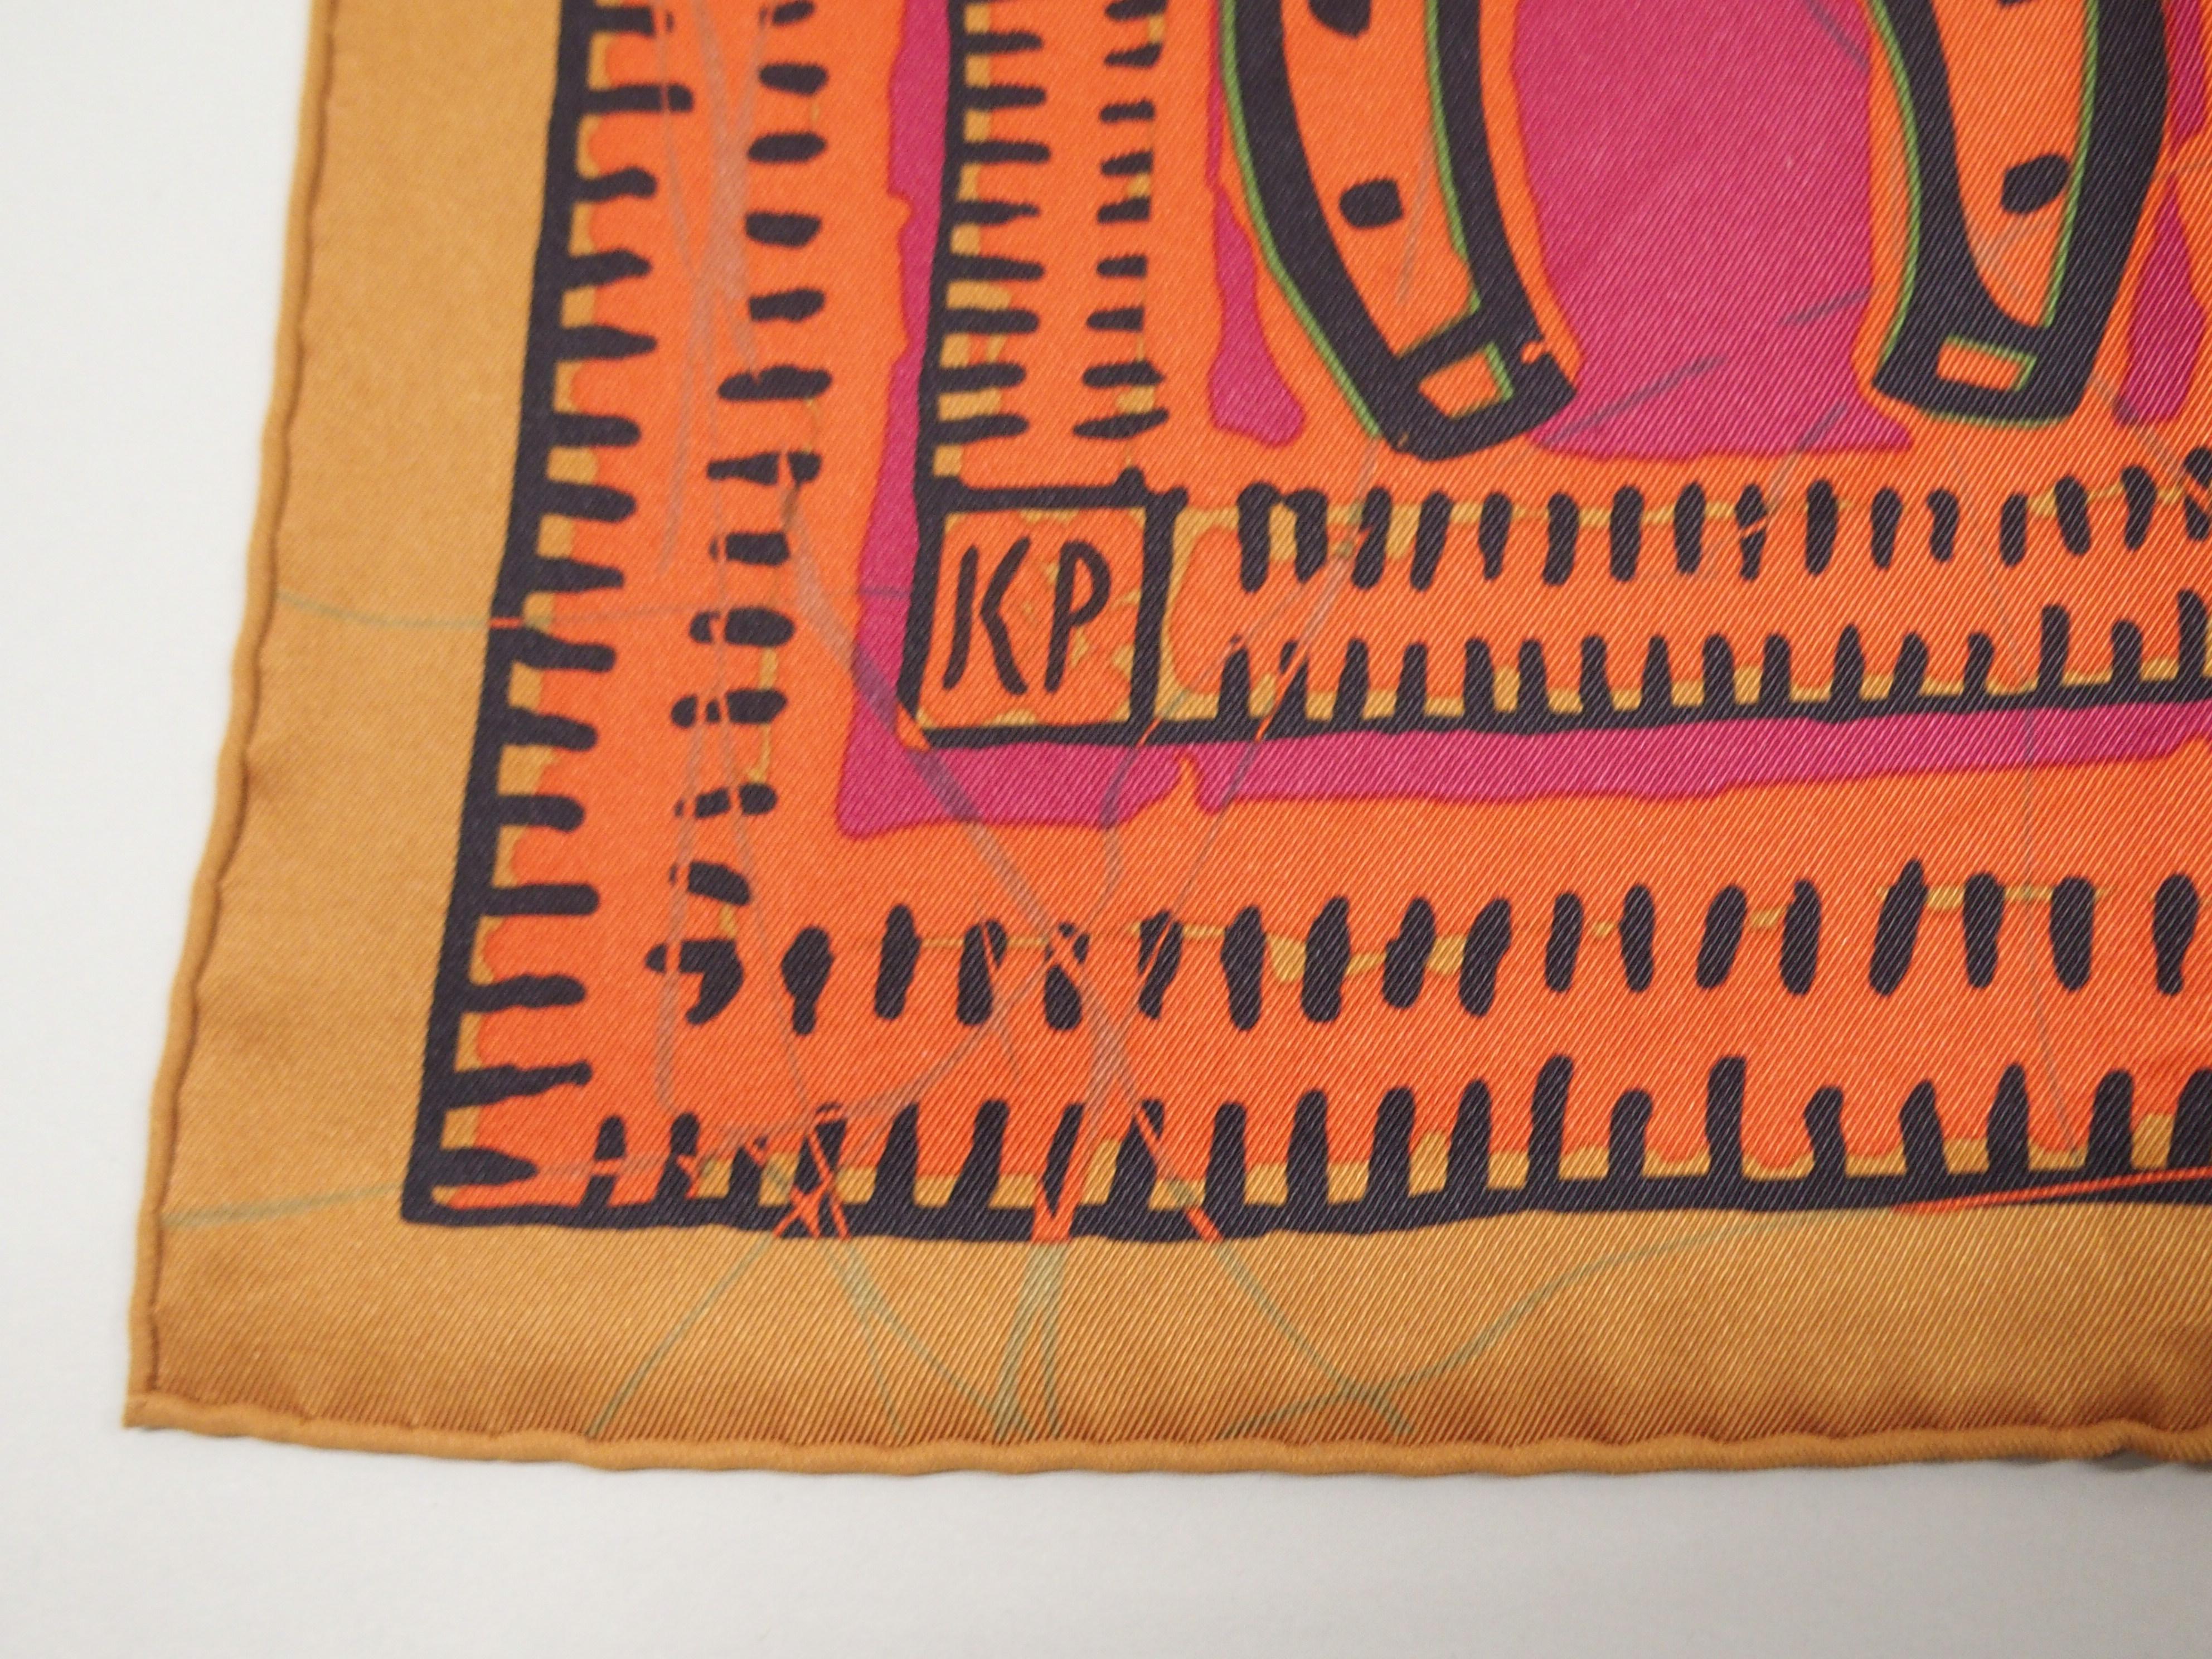 AN ORIGINAL LE BOUBOU H HERMES SILK SCARF designed by Karen Petrossian, in original box, 70 x 70cm - Image 4 of 5